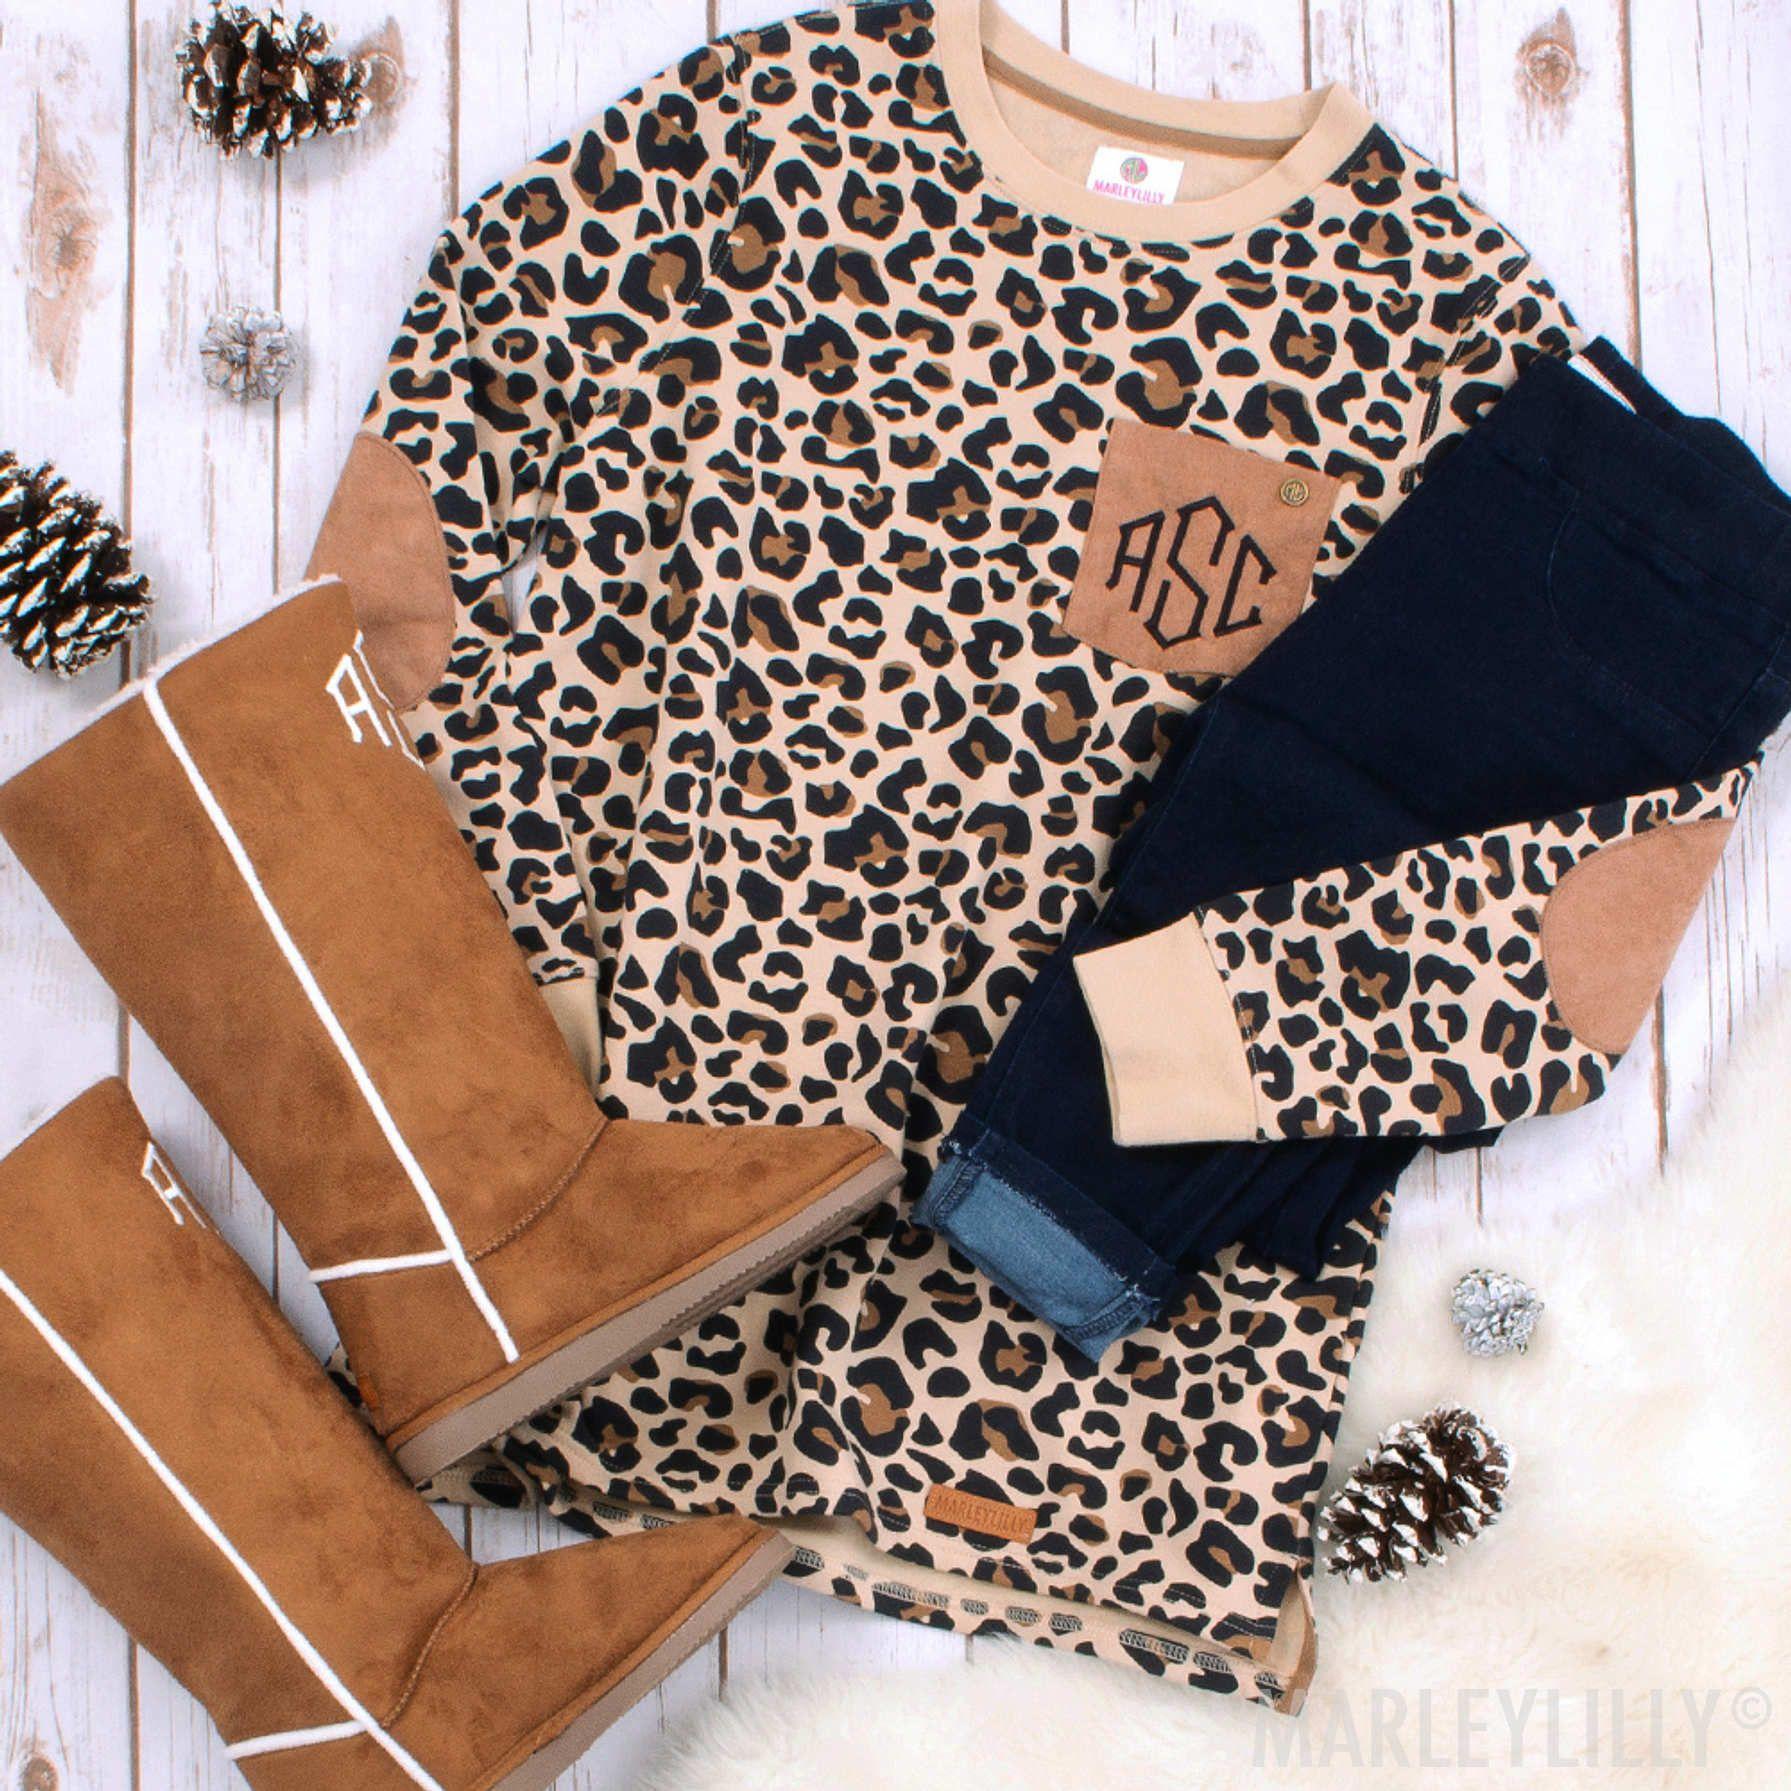 Monogrammed Leopard Print Sweatshirt Leopard Sweatshirt Leopard Print Sweatshirt Sweatshirts [ 1791 x 1791 Pixel ]